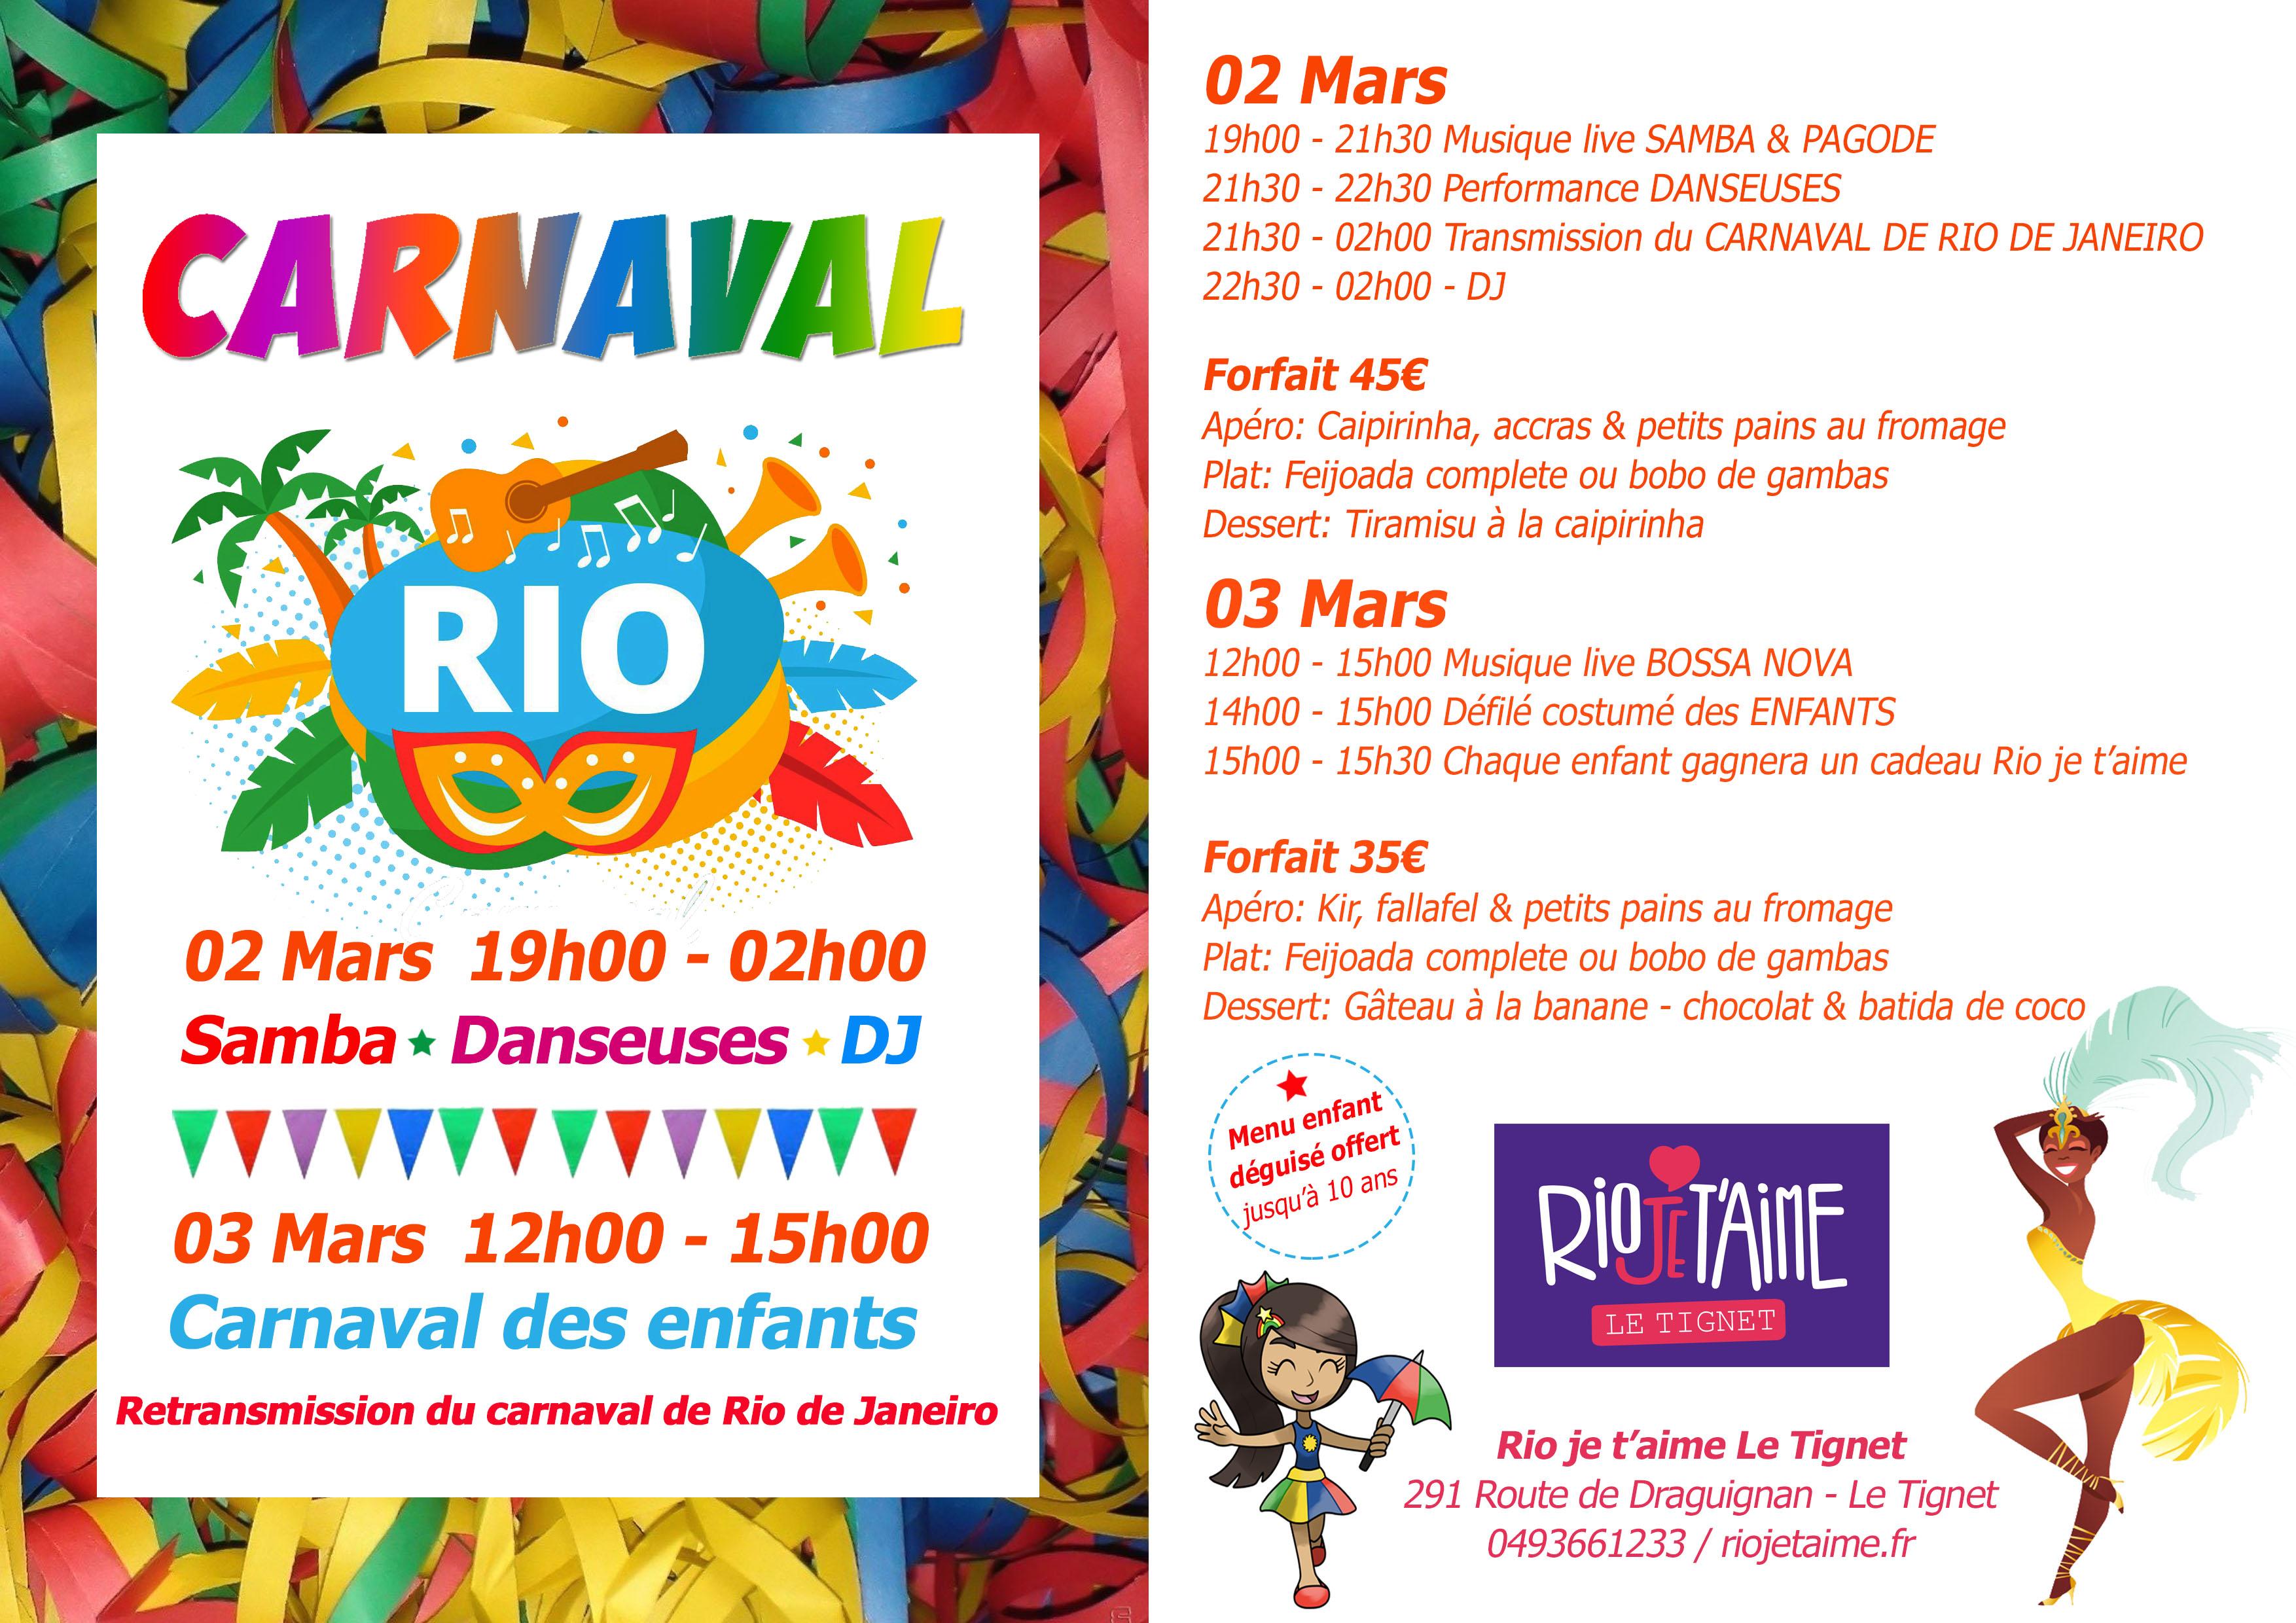 CARNAVAL RIO JE TAIME